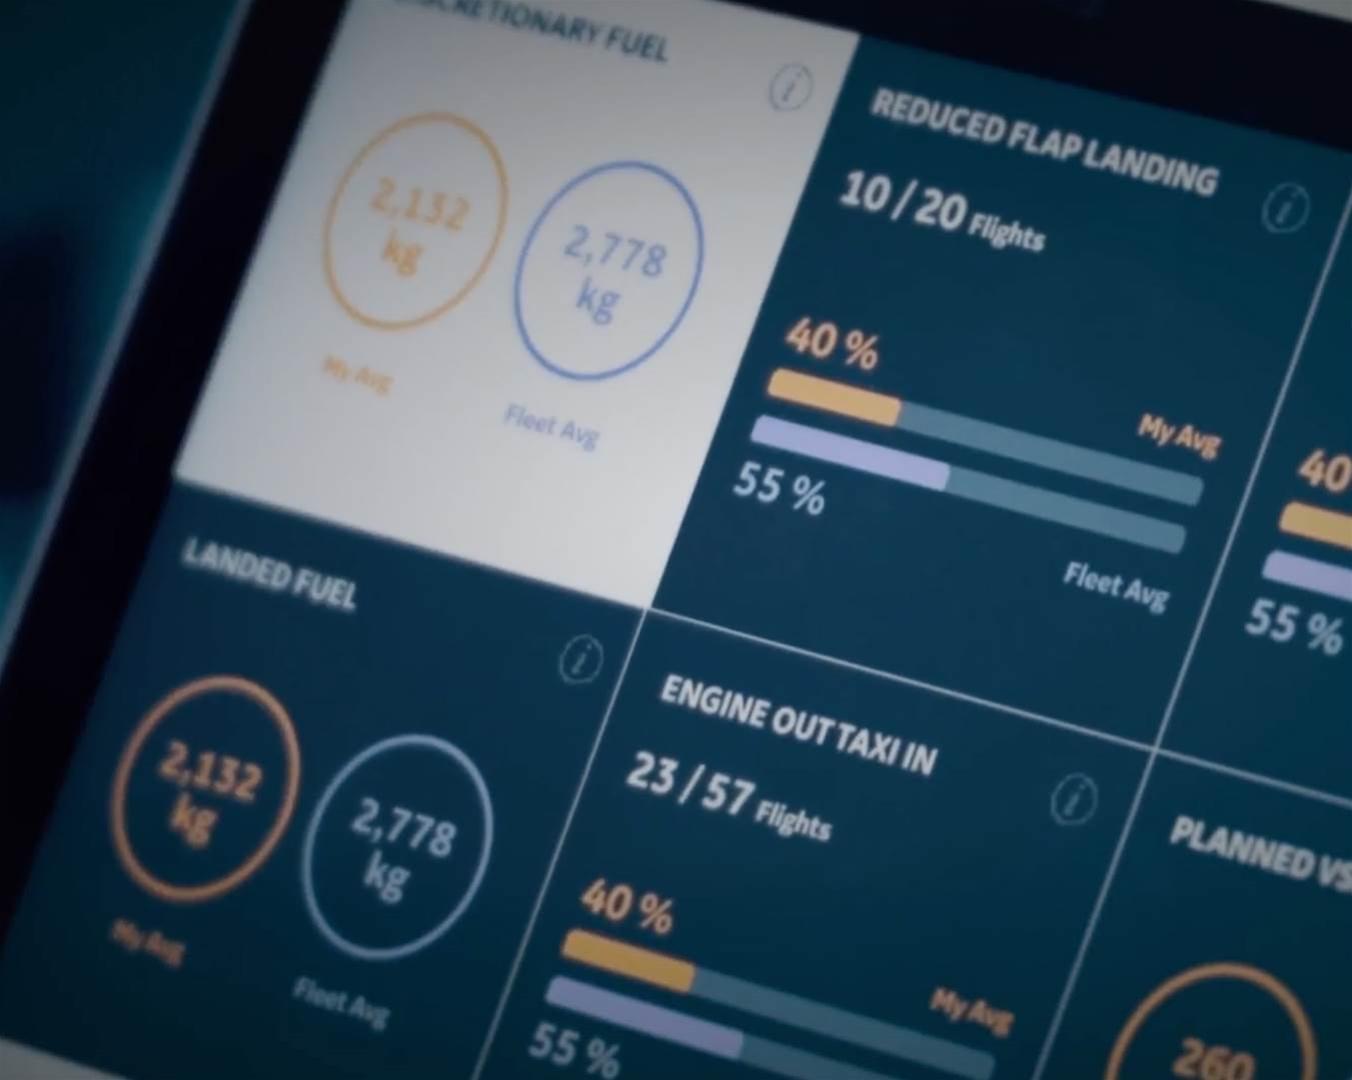 Qantas pilots get mobile flight data application